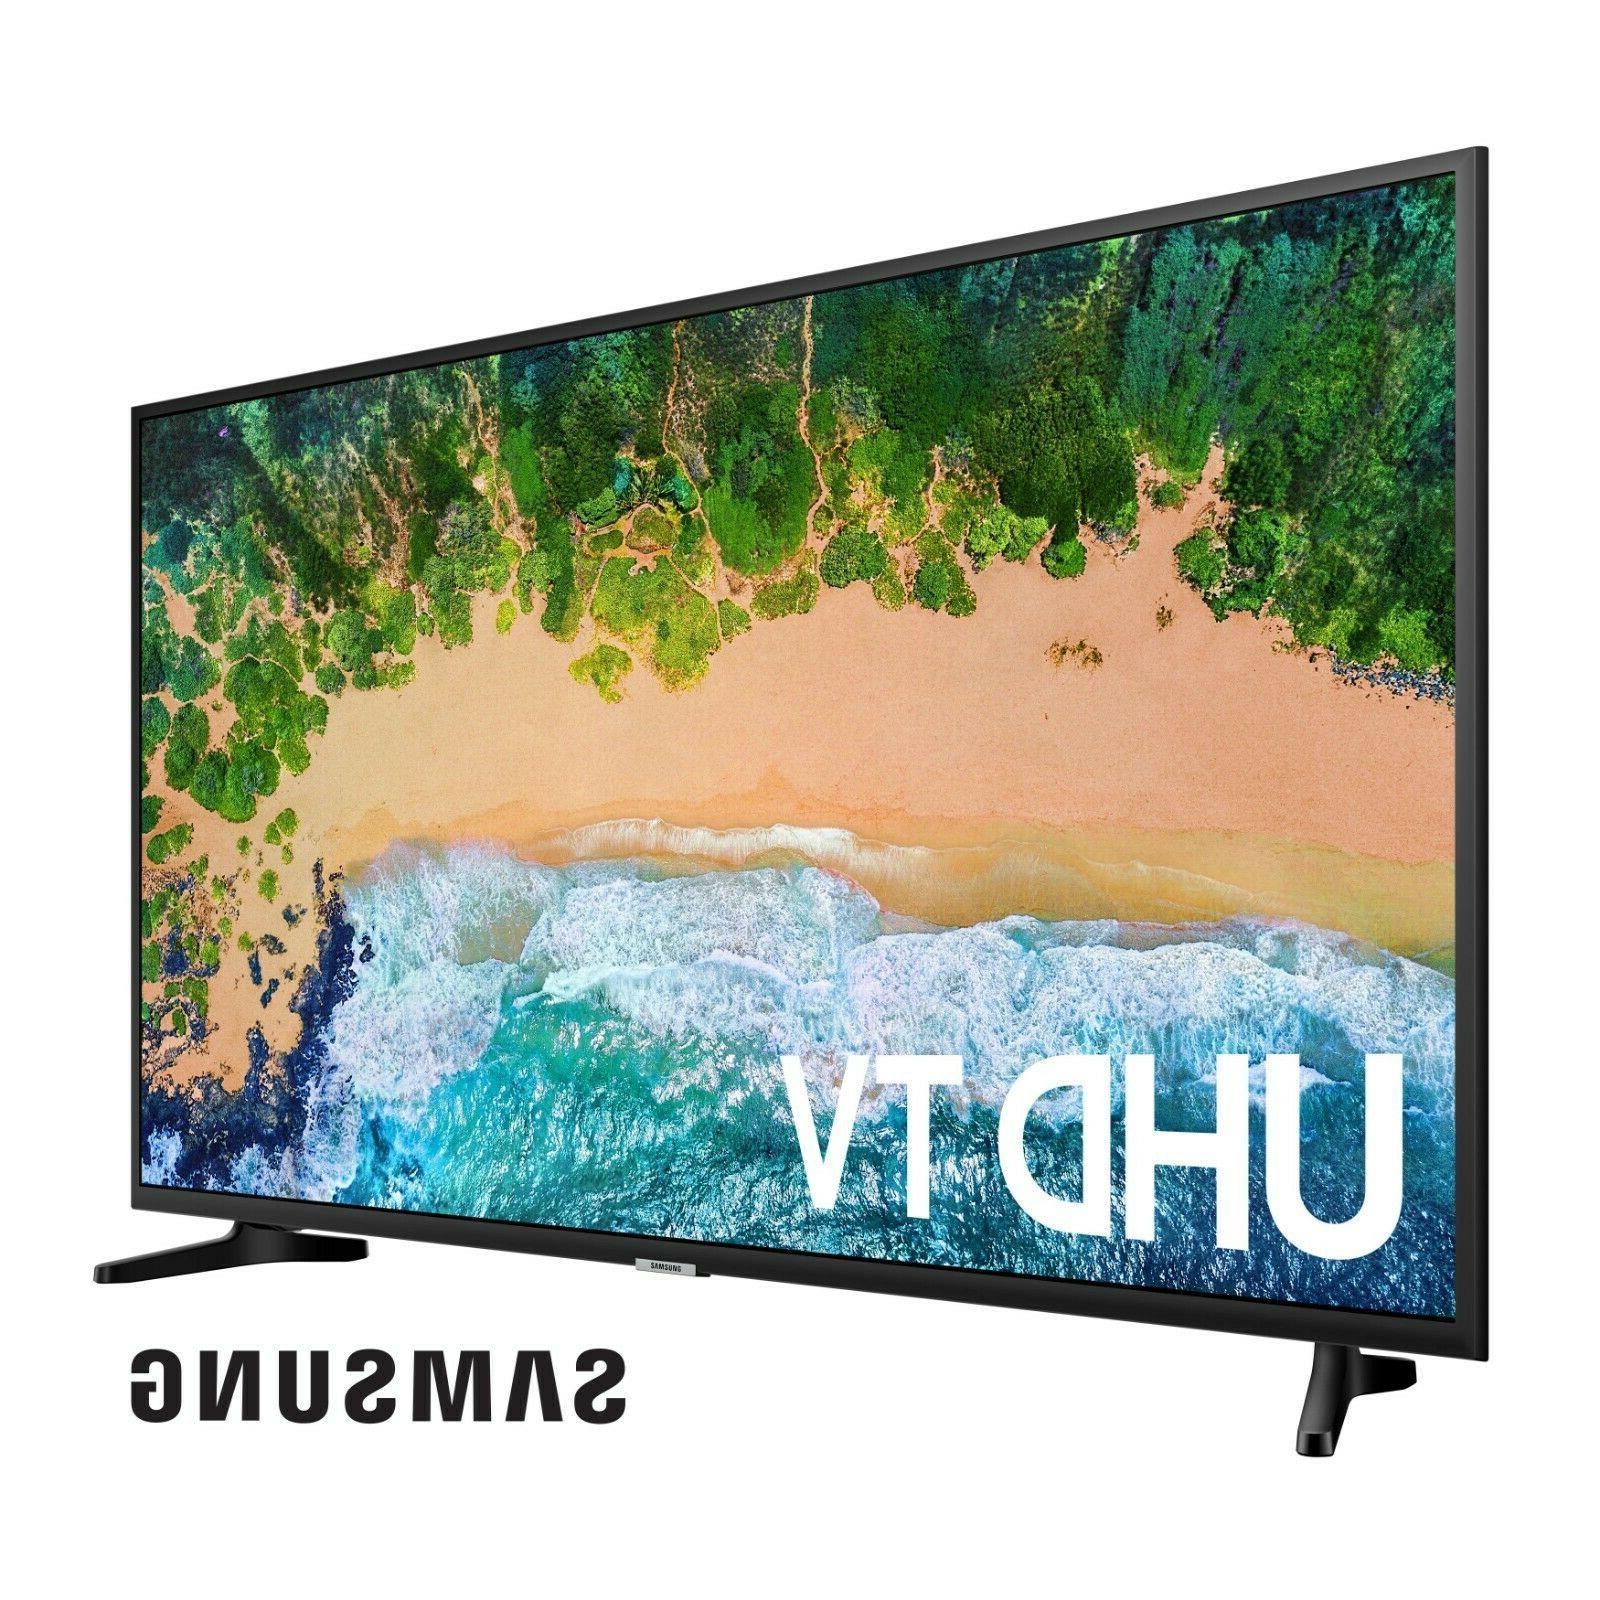 Samsung UN55NU6900FXZA 55 inch 2160p 4K UHD LED TV Smart Pho